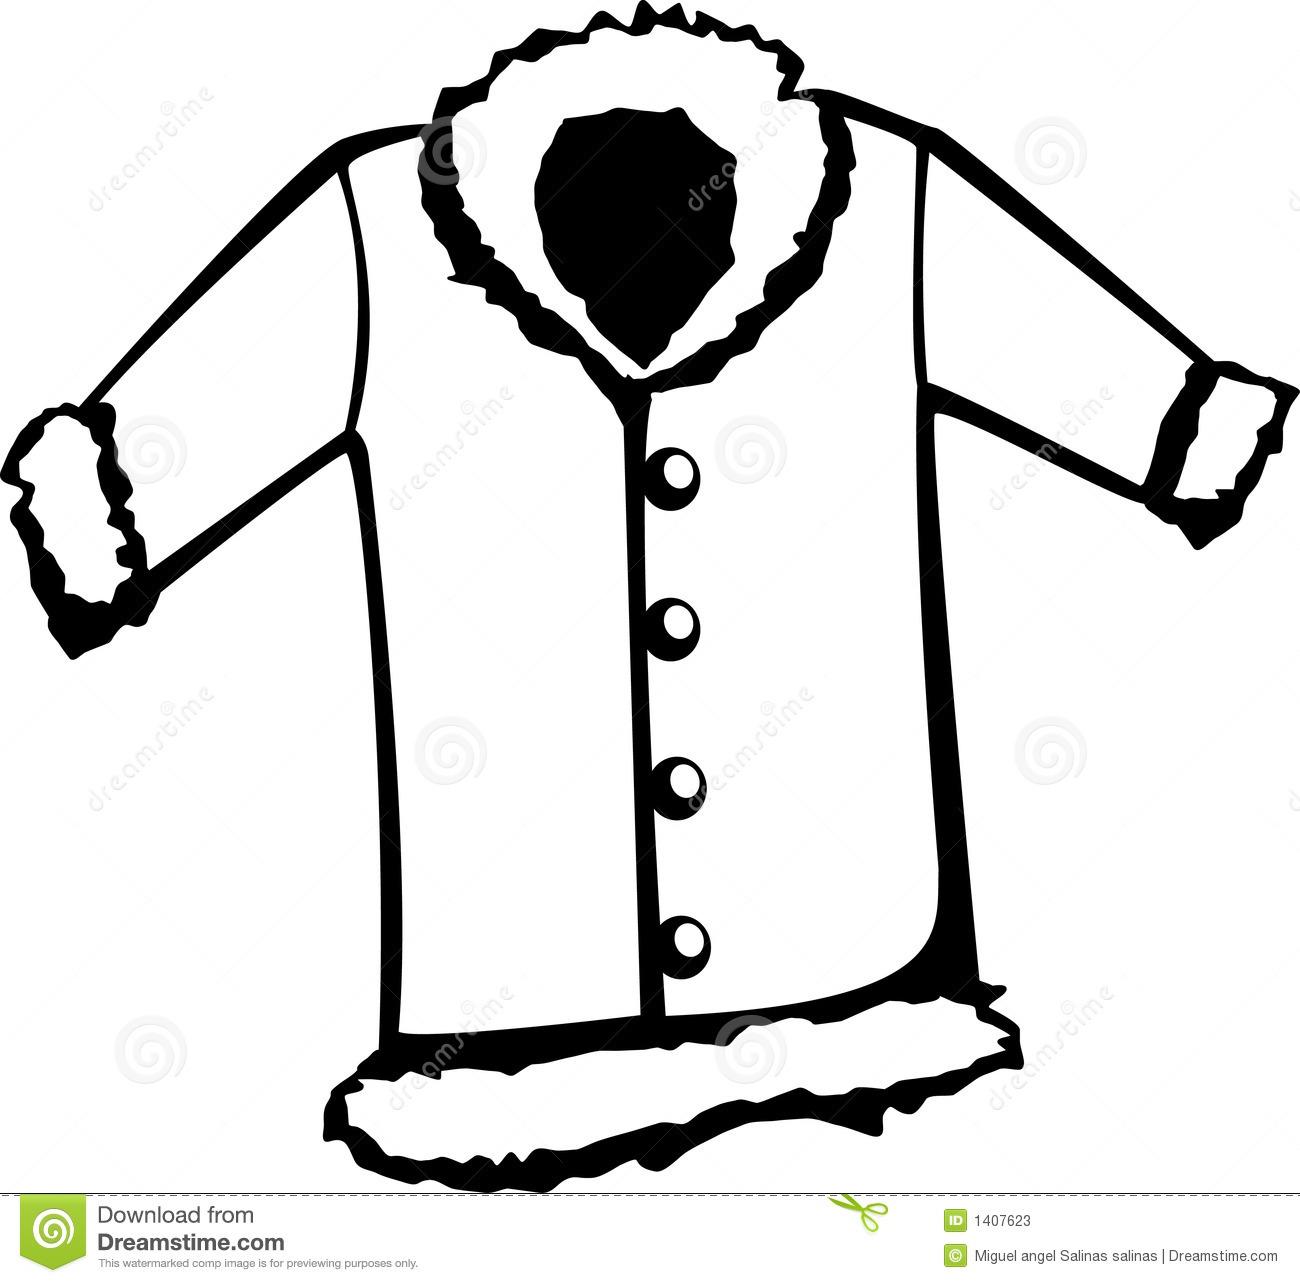 Fur Coat Vector Illustration Stock Photo-Fur Coat Vector Illustration Stock Photos Image 1407623-8